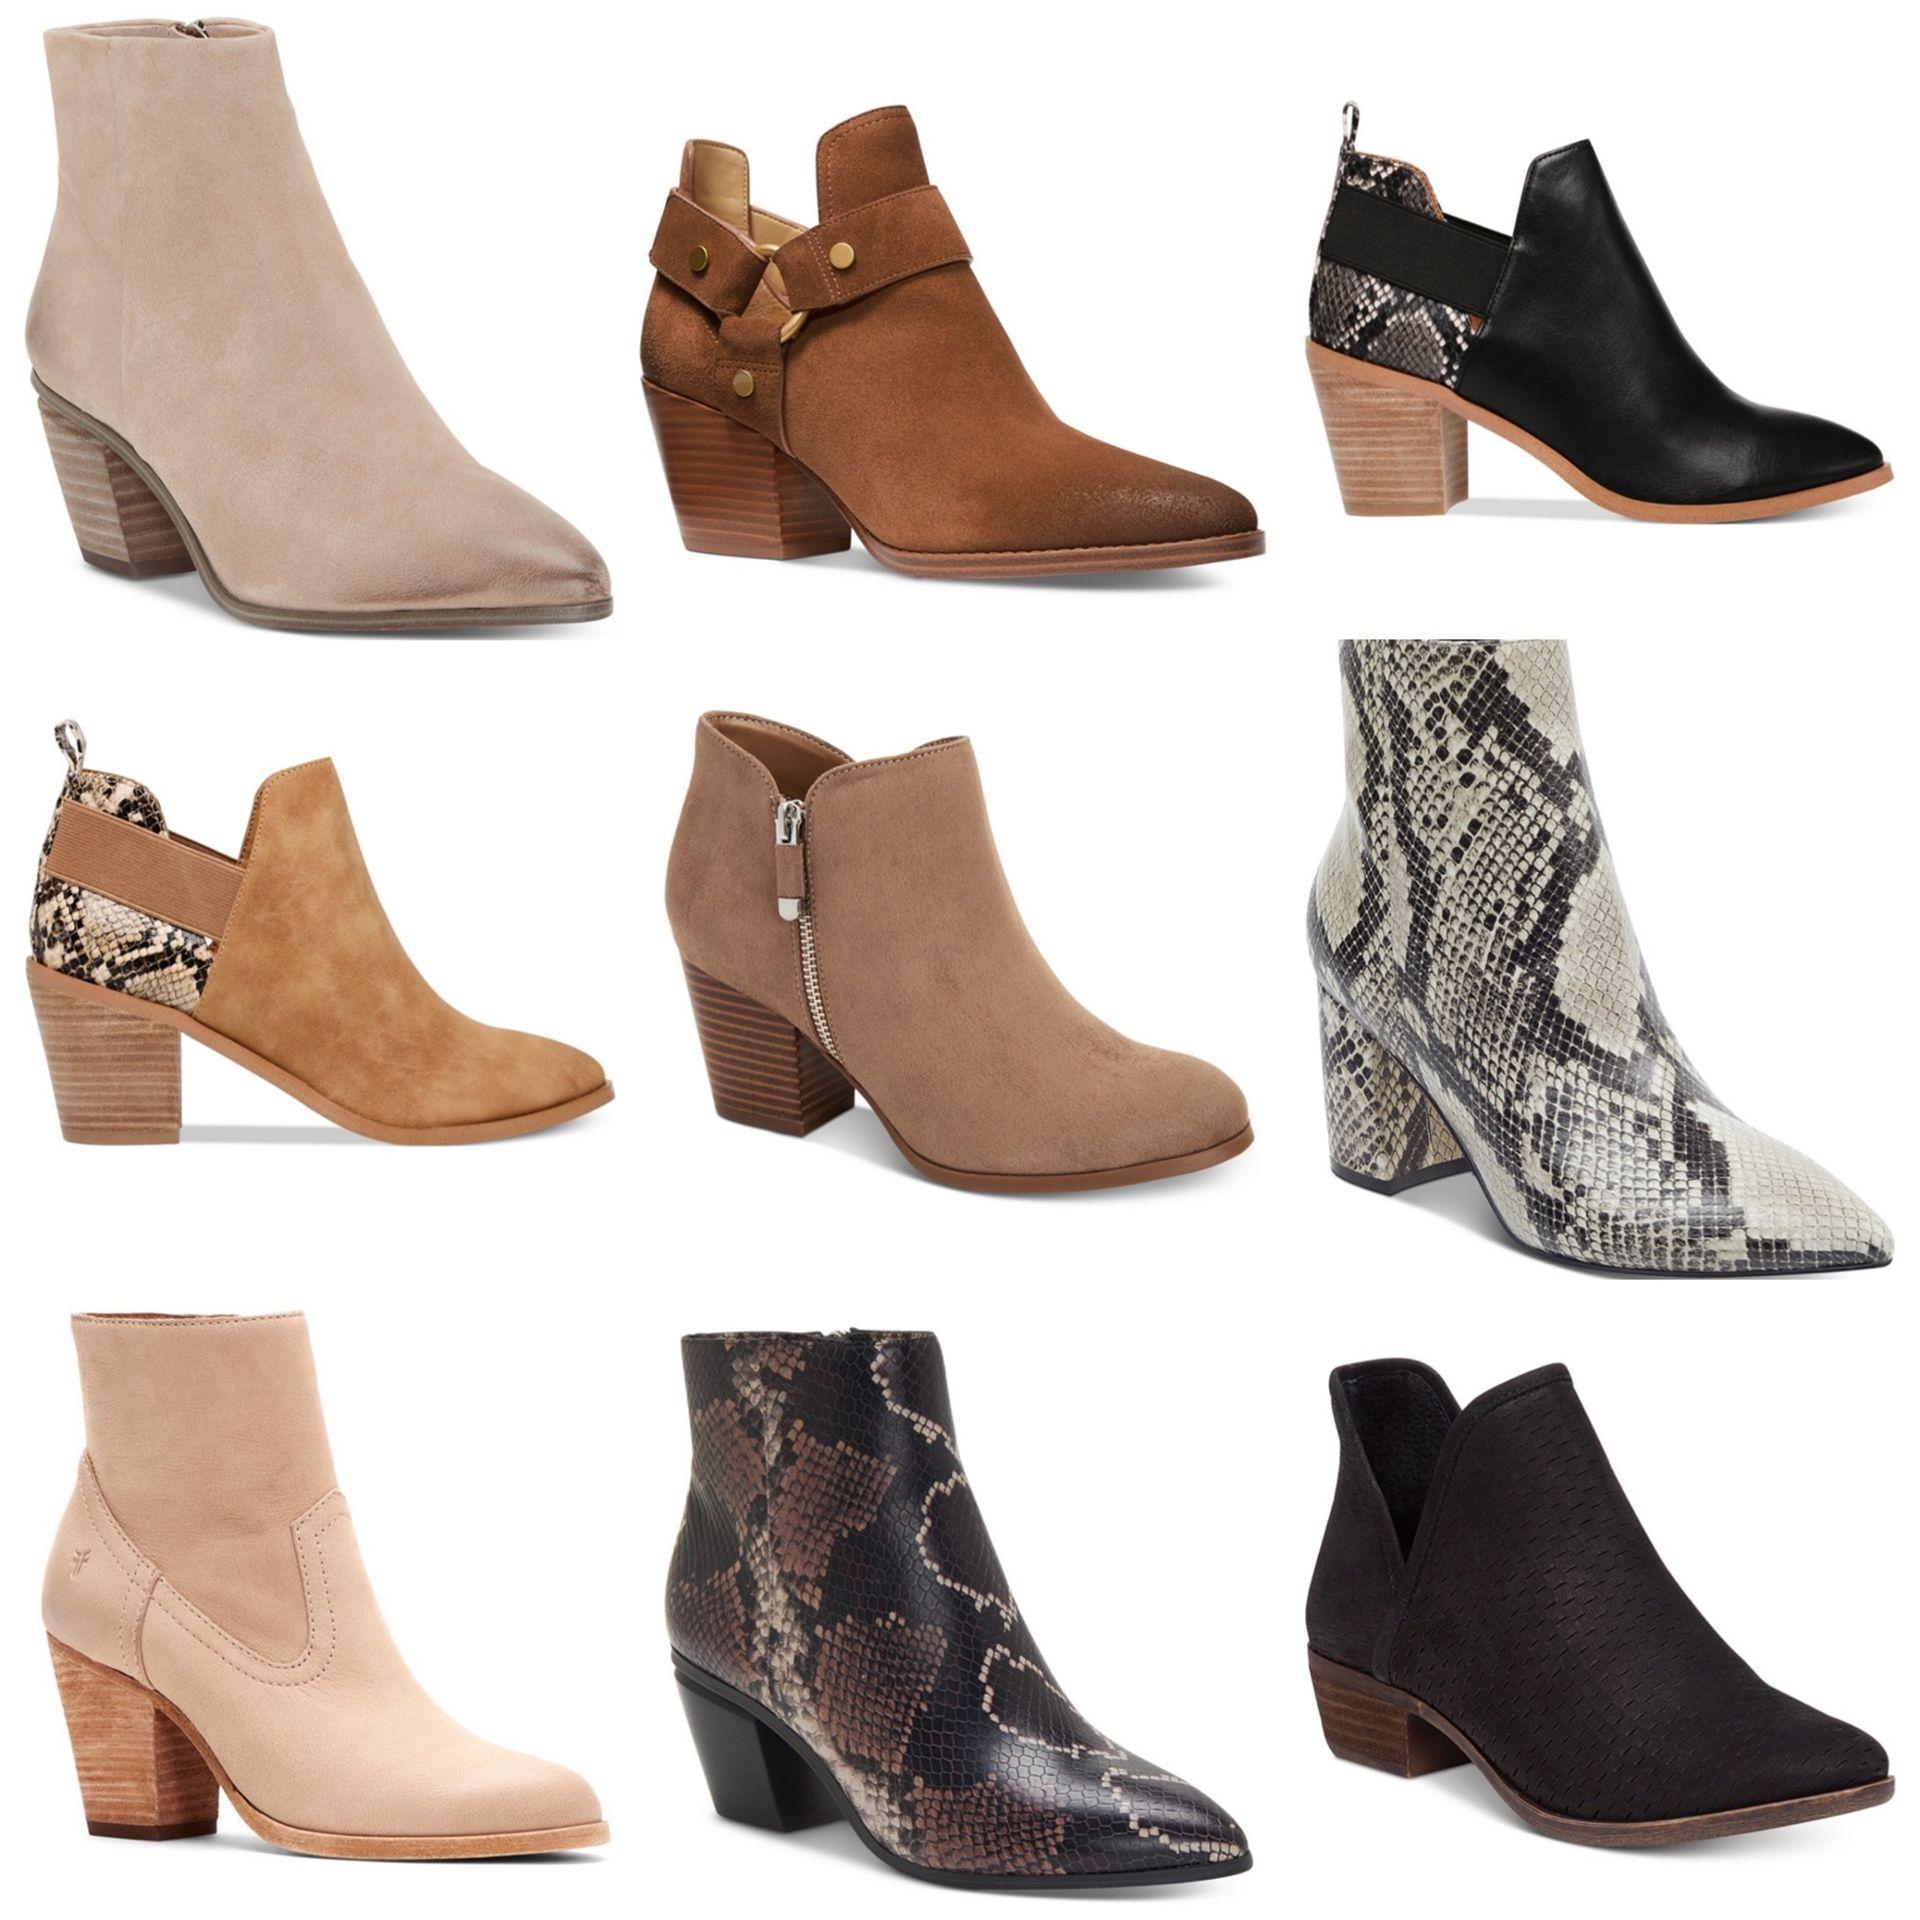 The great shoe sale! - Macys Style Crew